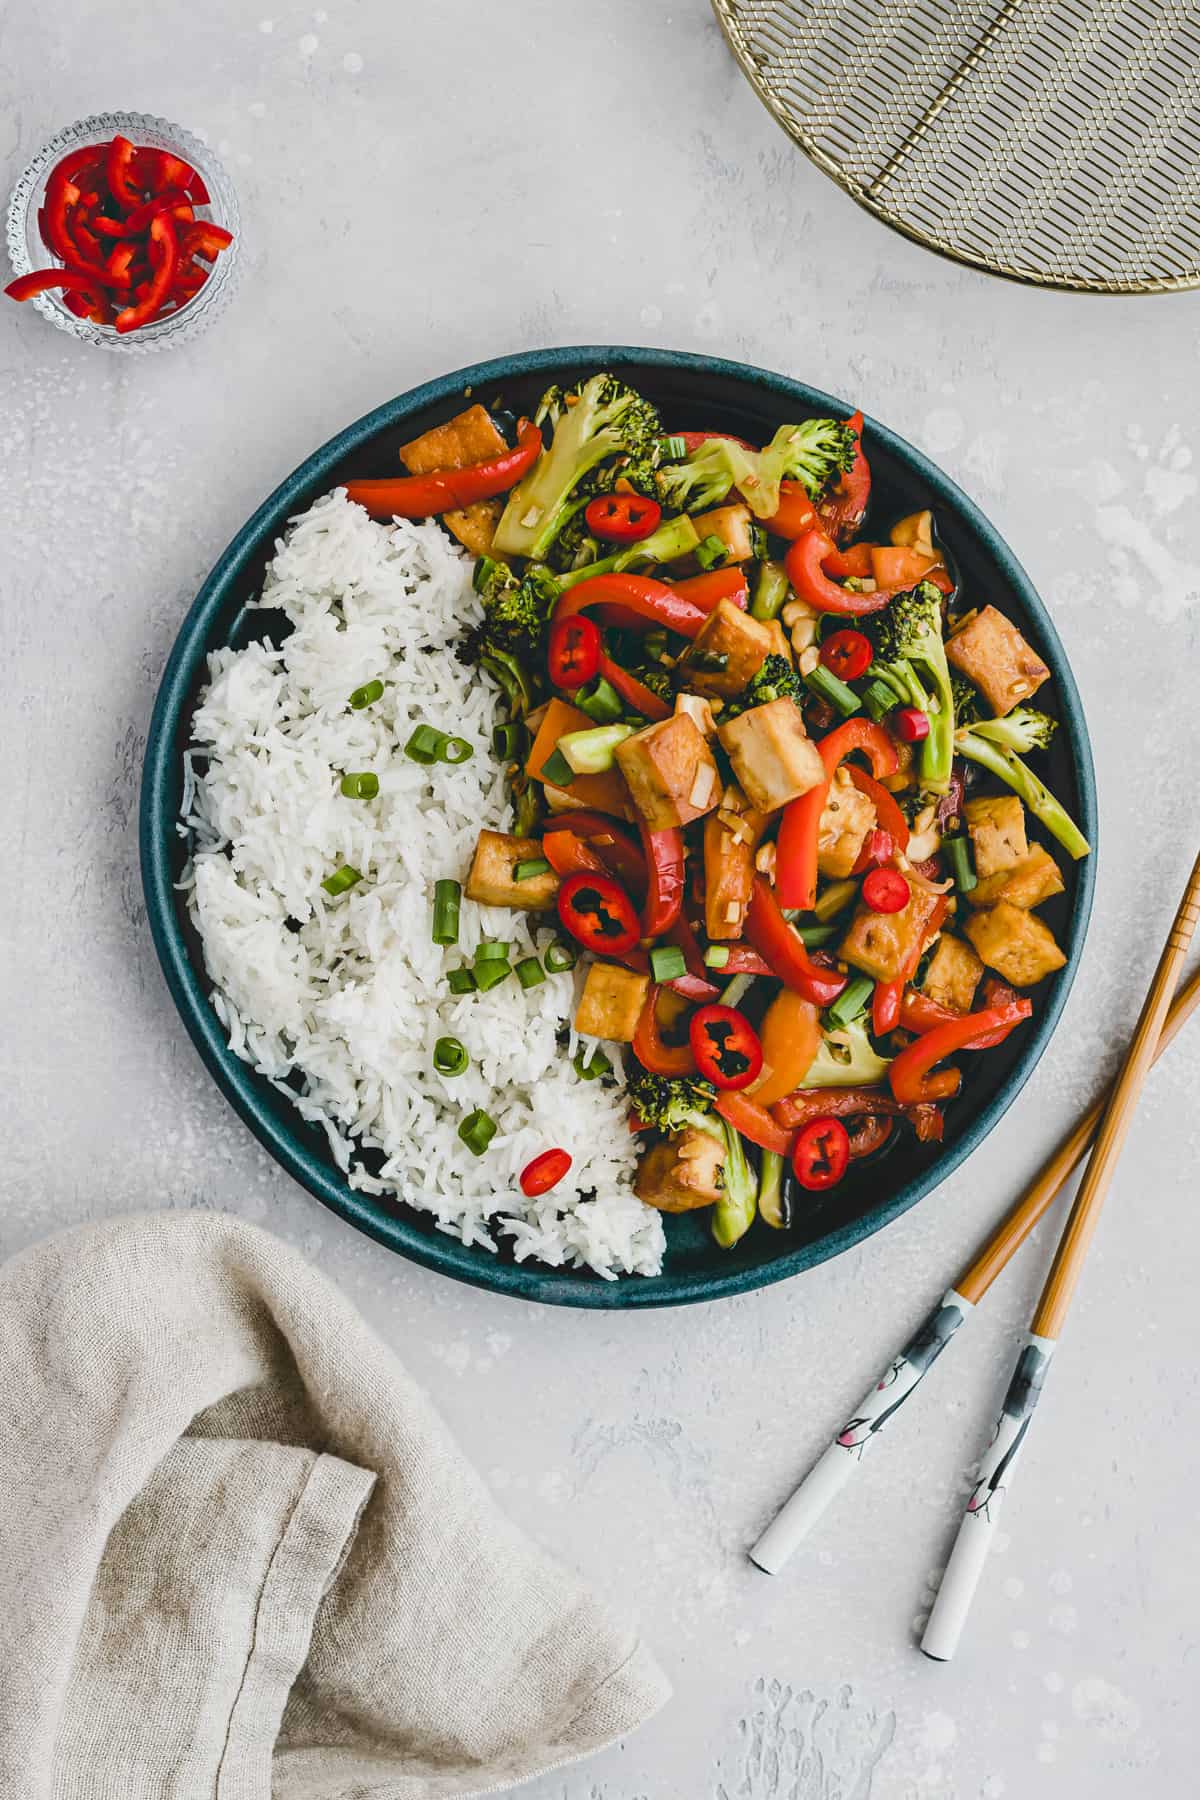 tofu stir fry on a plate next to chopsticks